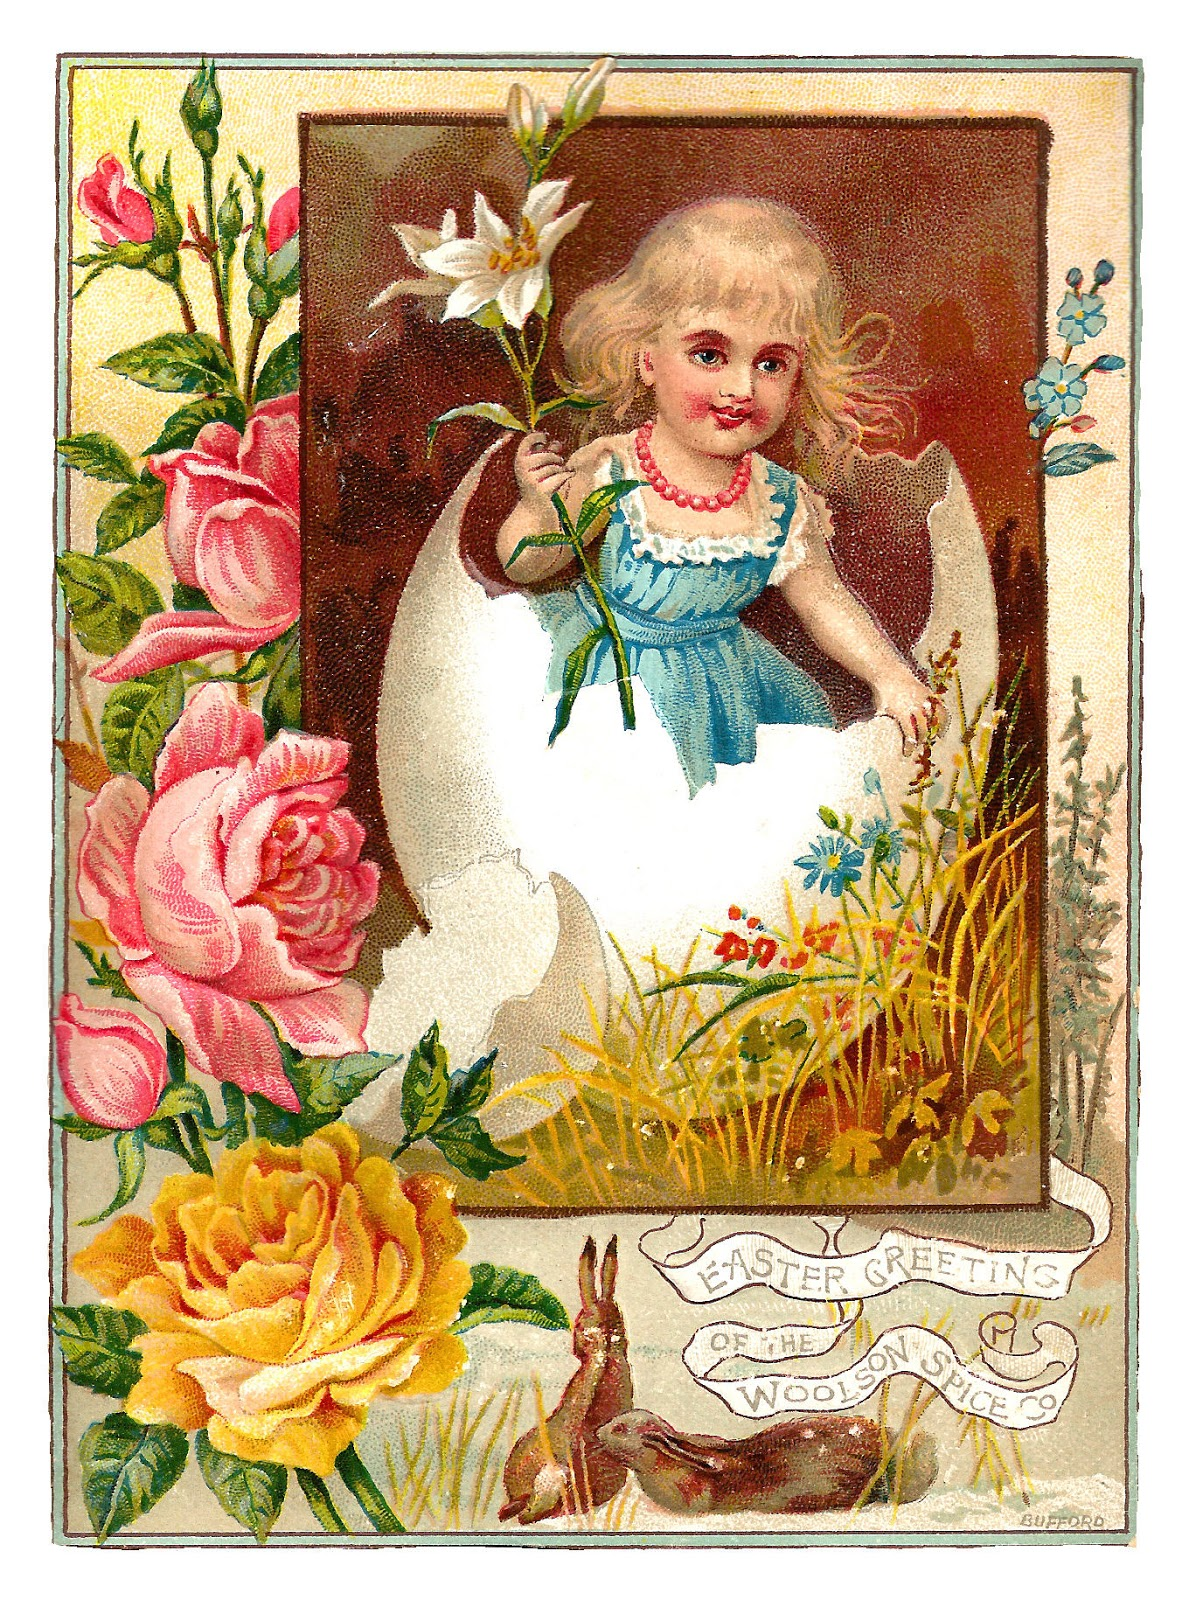 http://2.bp.blogspot.com/-snPF5ybfKbk/U0mb4YLAKcI/AAAAAAAAThY/xp1-SWw_jQY/s1600/easter_roses_girl_egg_lily_card.jpg